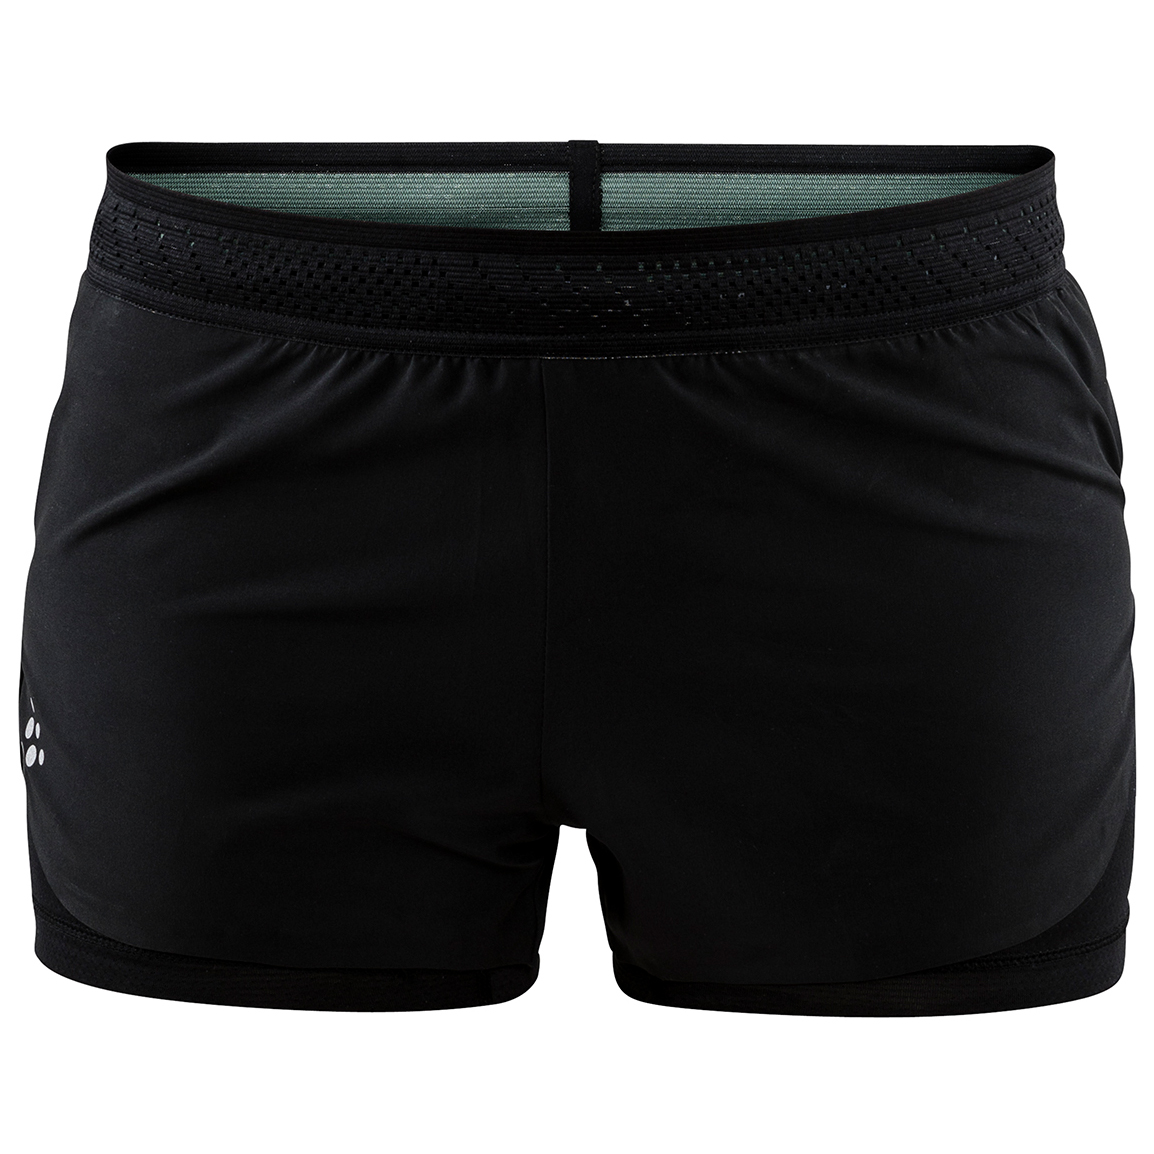 19d22ad1 Craft Craft Nanoweight Shorts - Running Shorts Women's | Buy online ...